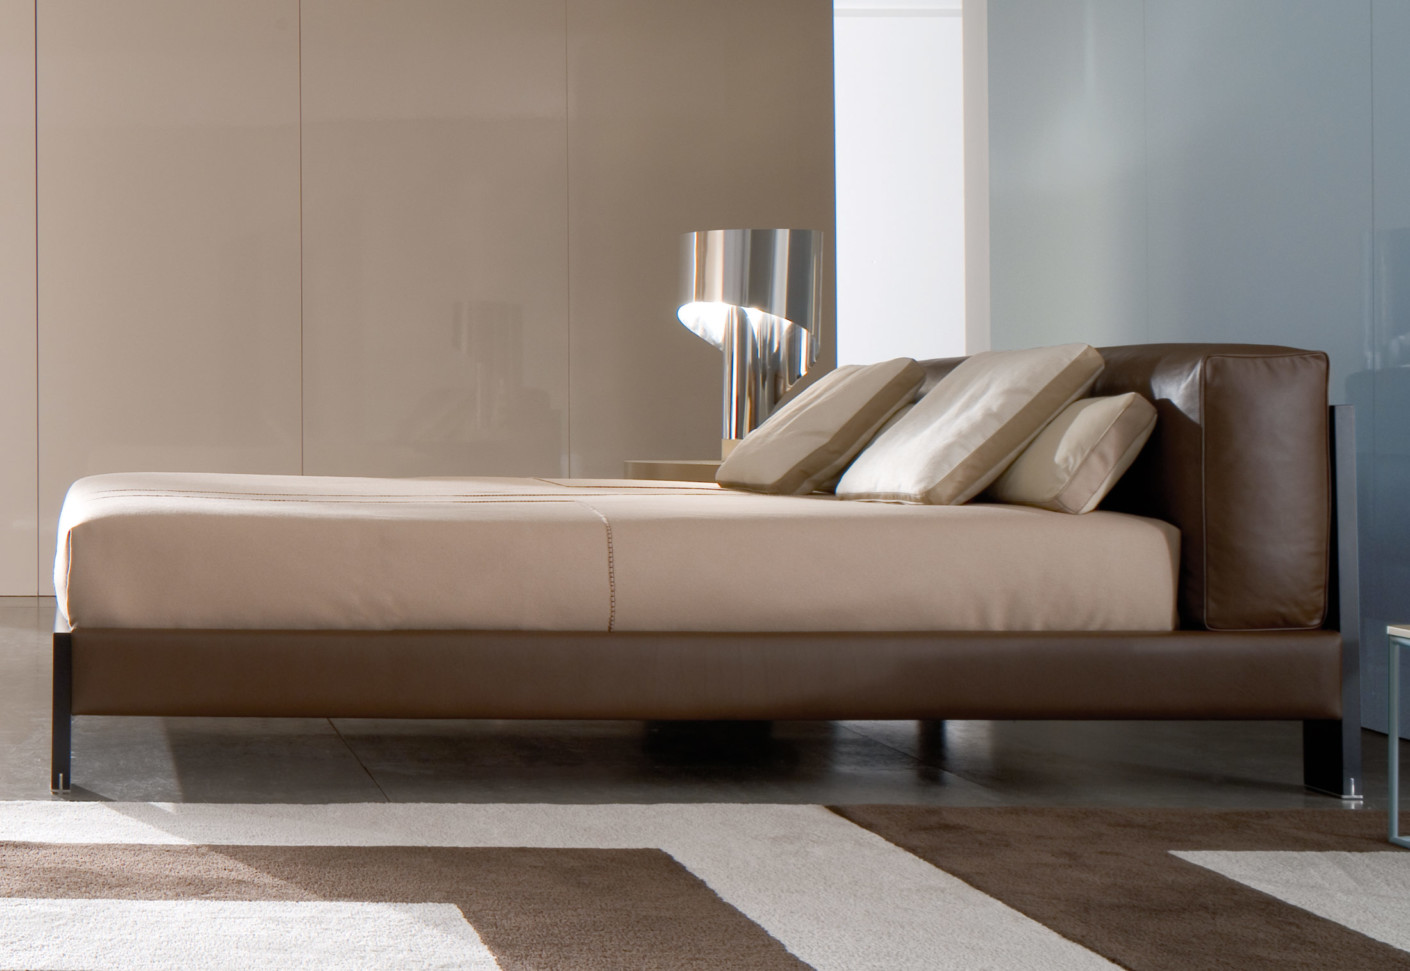 Alison Black Bed By Minotti Stylepark